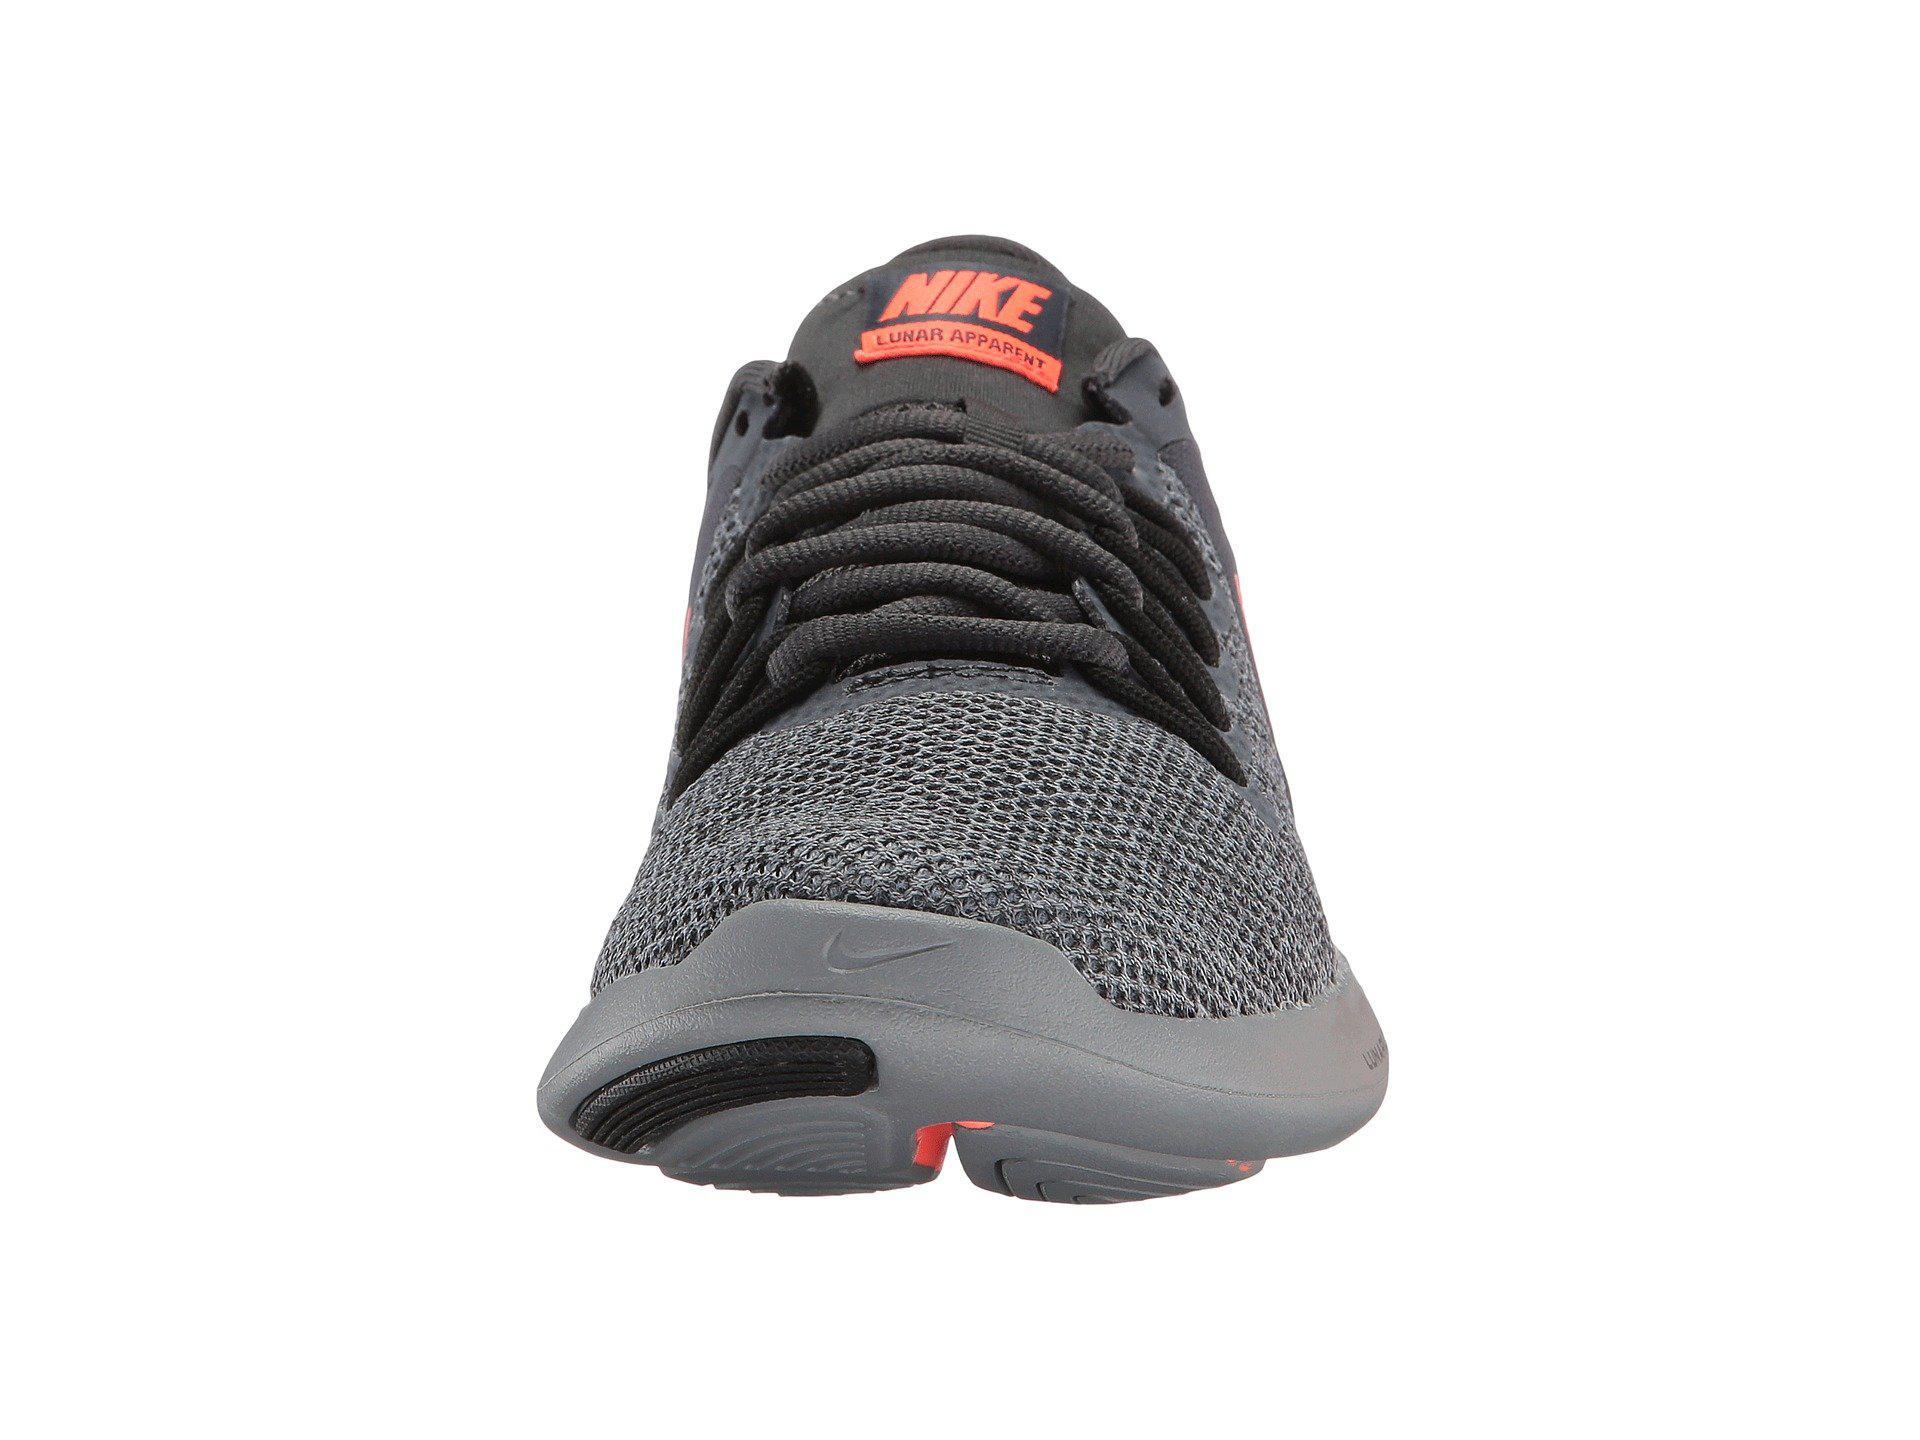 6711d45dc1b5 Lyst - Nike Lunar Apparent for Men